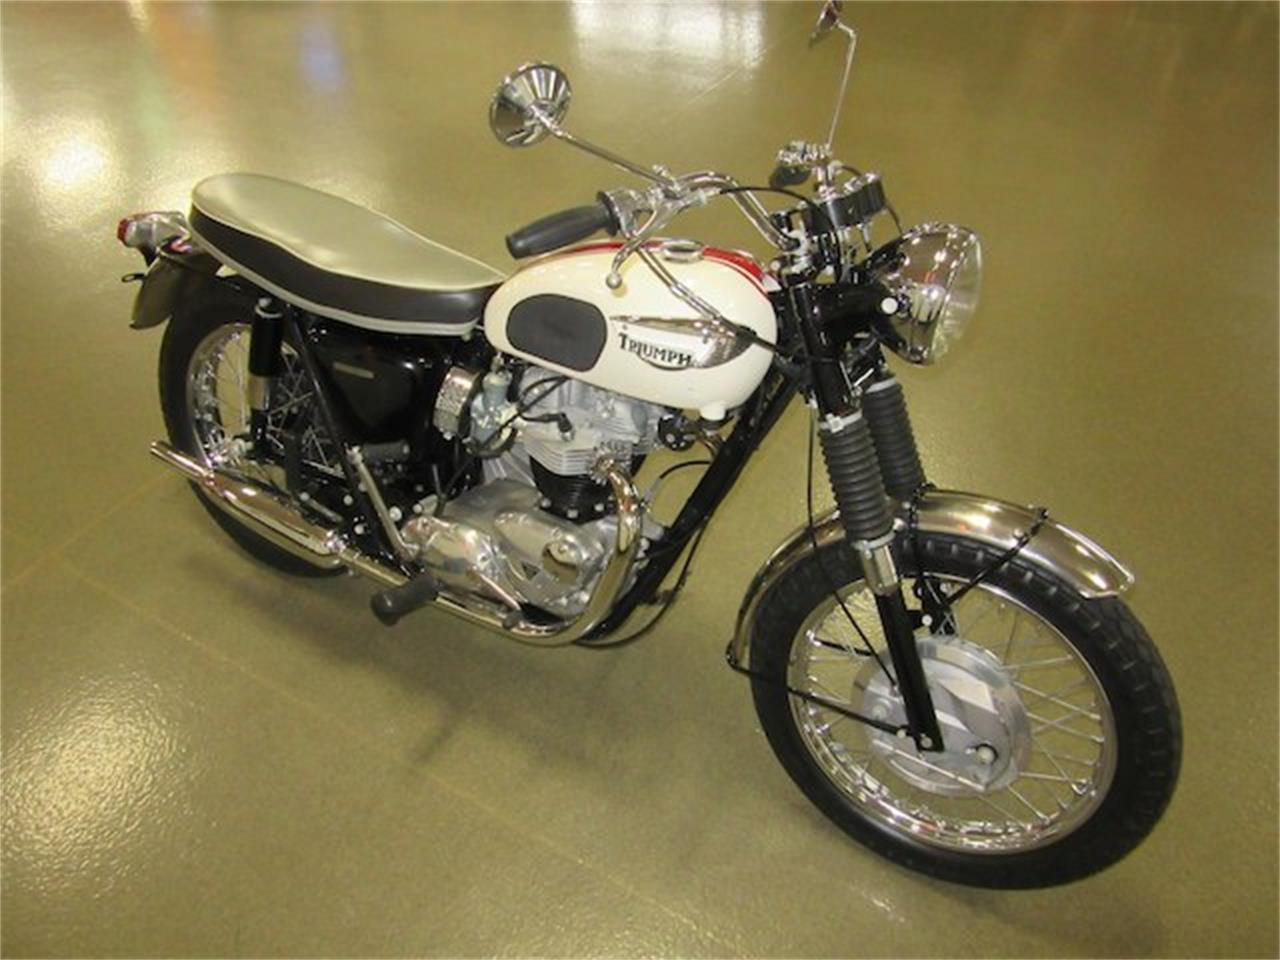 1966 Triumph T120r For Sale Classiccarscom Cc 1114229